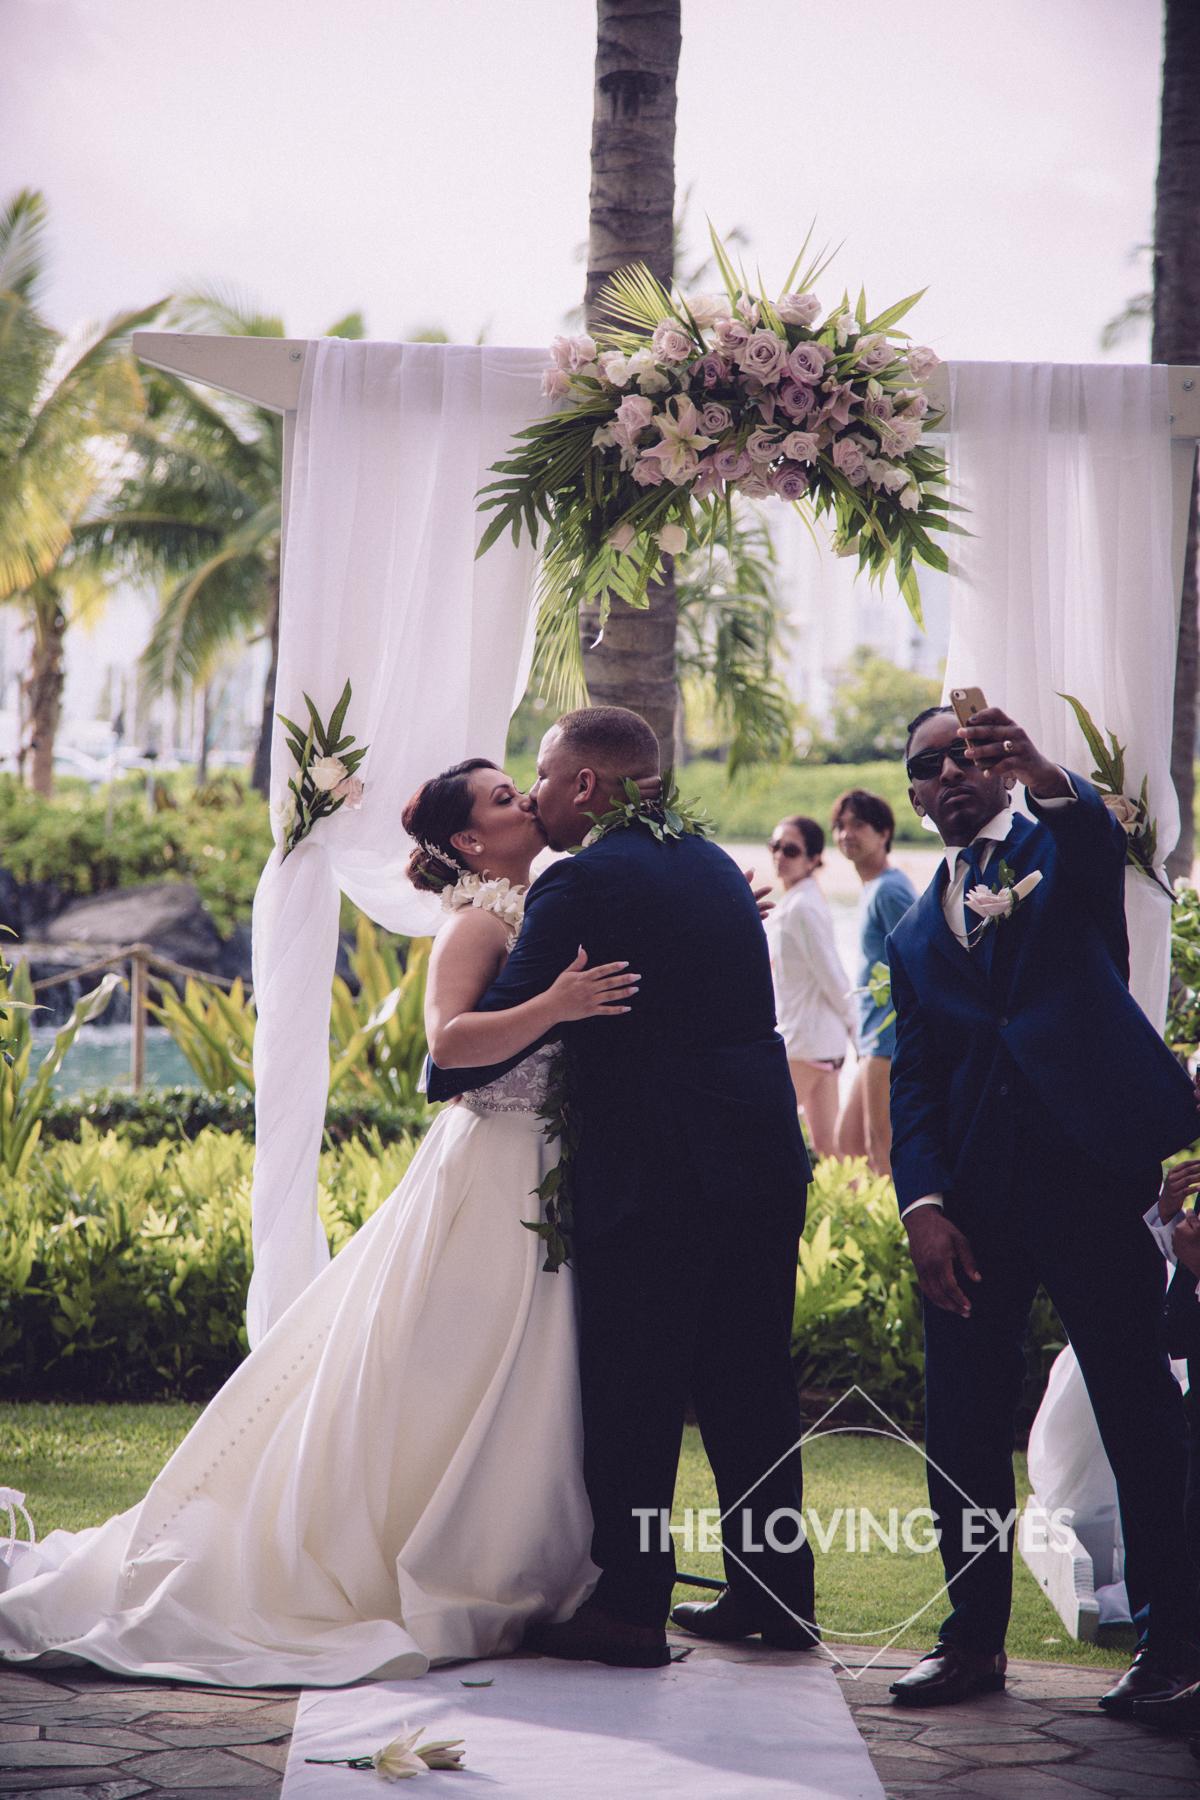 First Kiss during wedding ceremony at Hilton Hawaiian Village Rainbow Suite in Waikiki